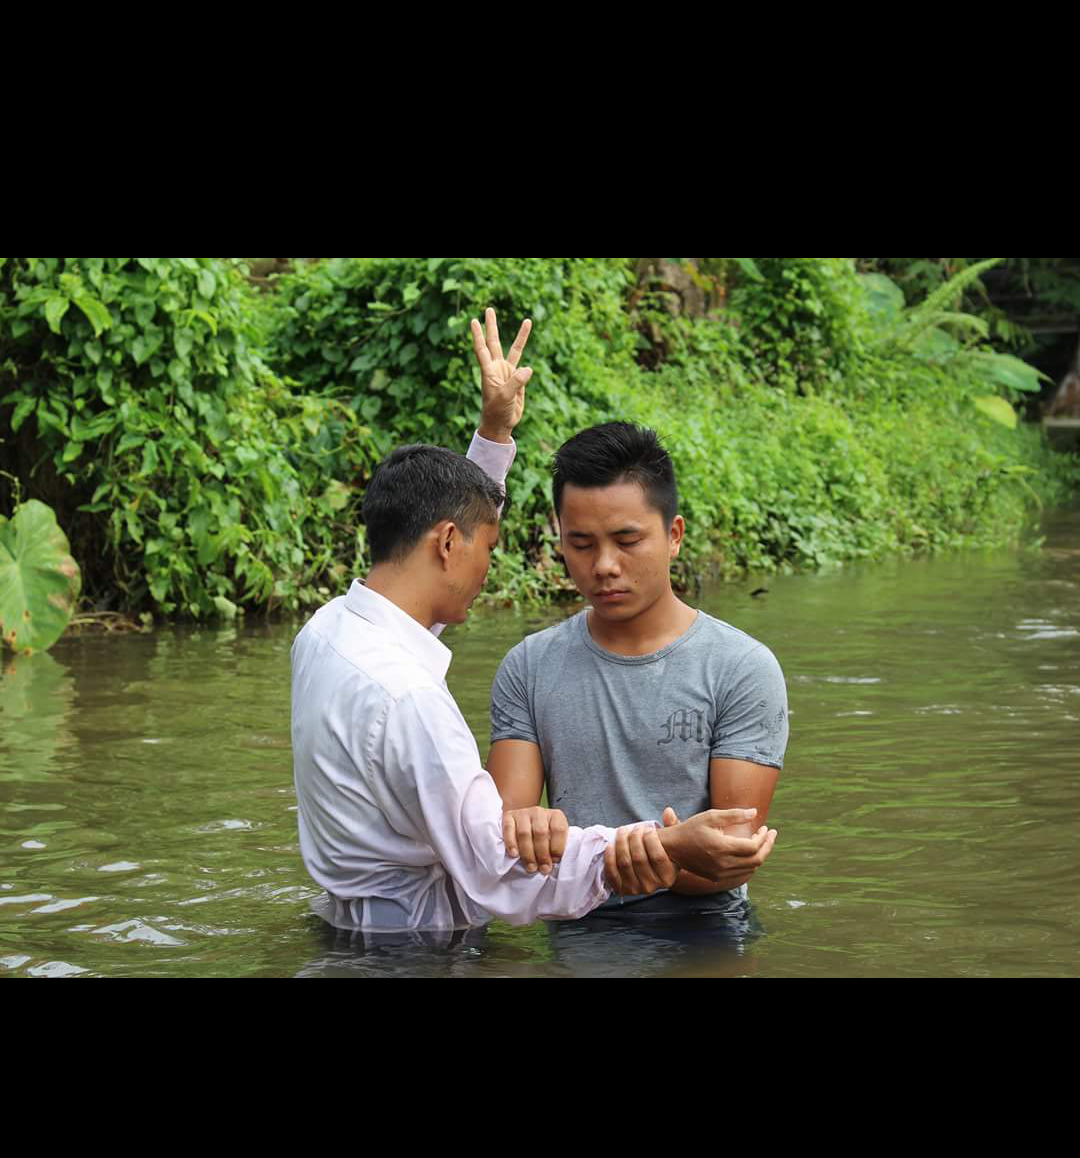 Image result for Bawipa zanriah hmannak